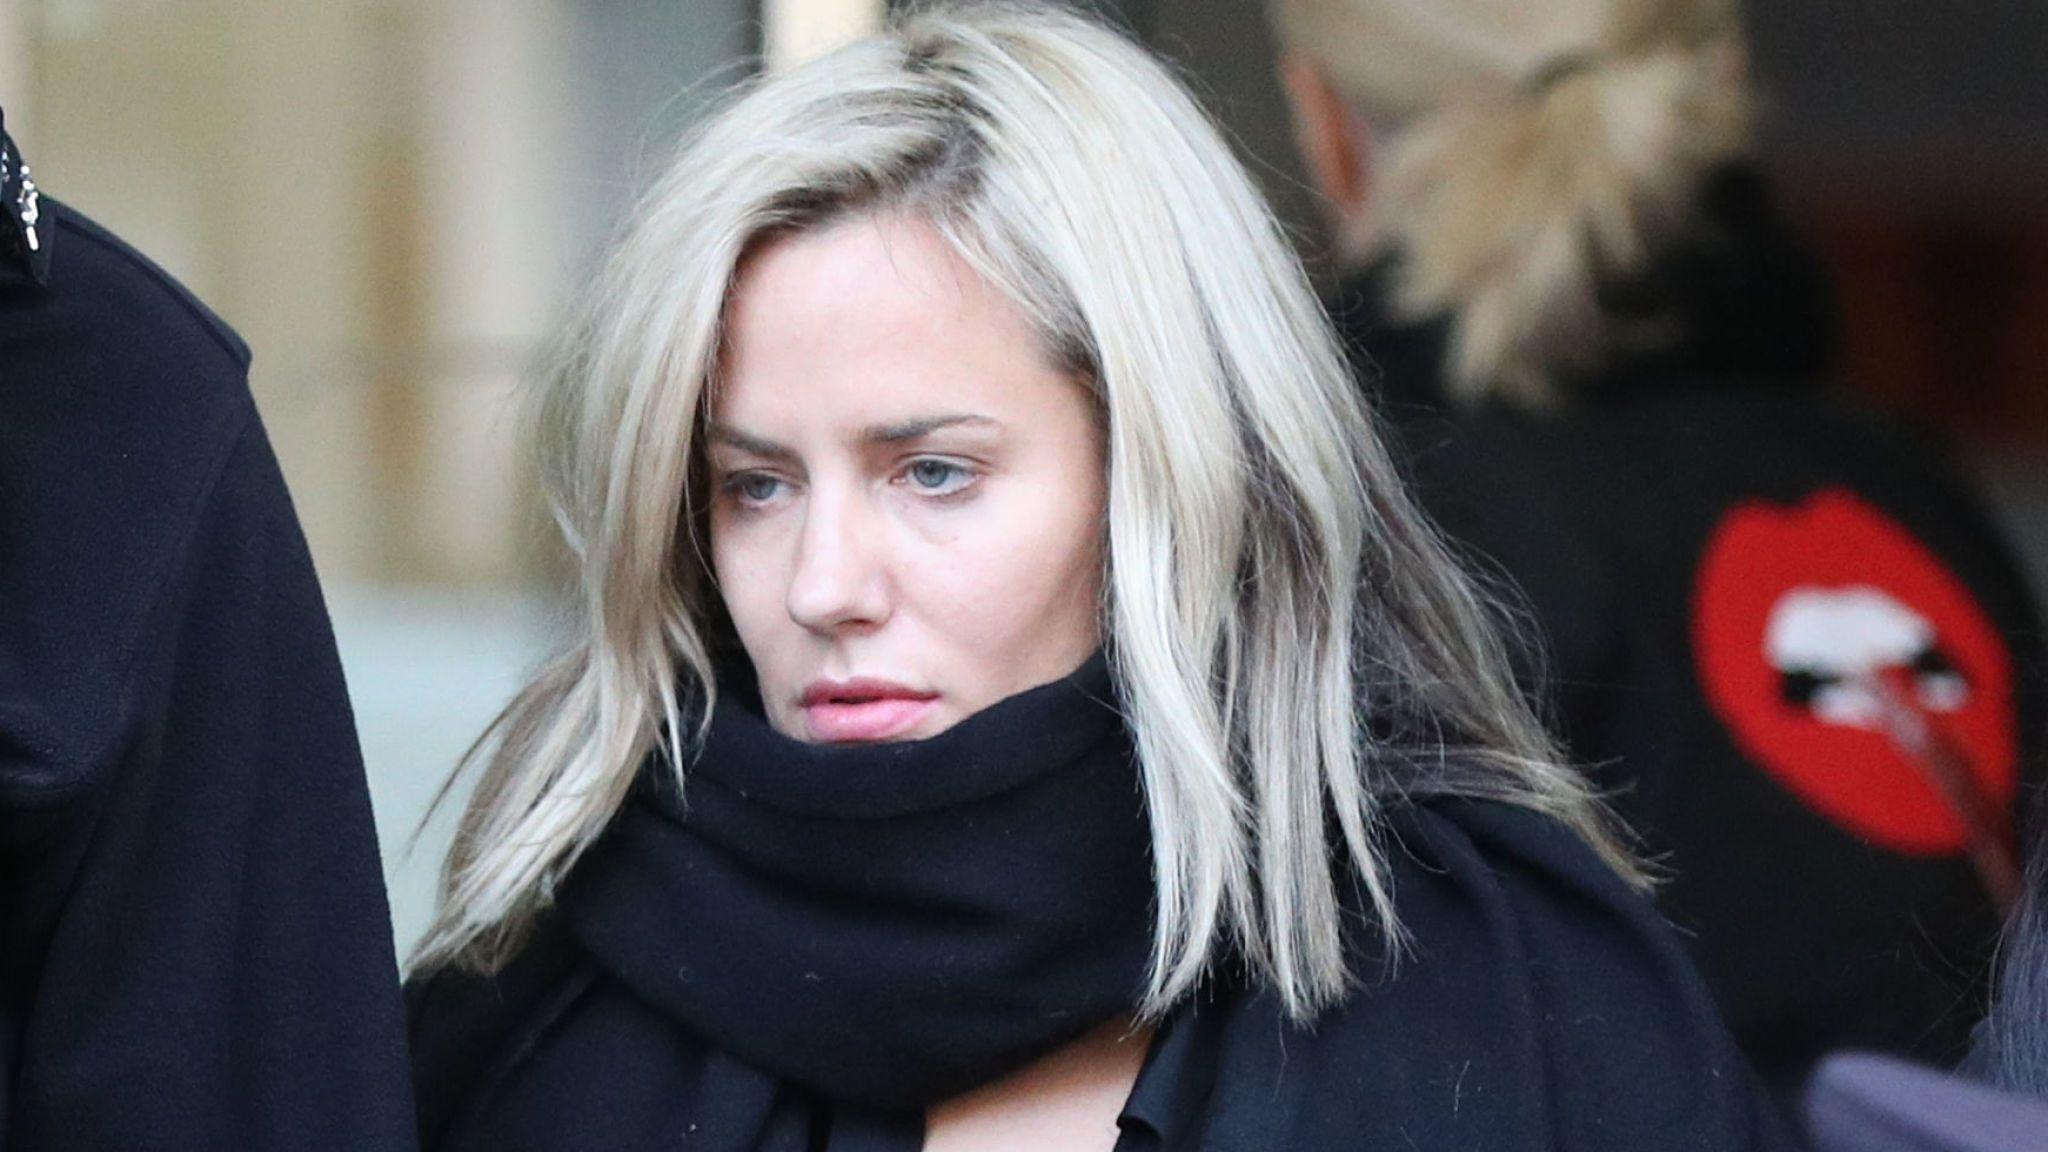 Caroline Flack leaves Highbury Corner Magistrates' Court